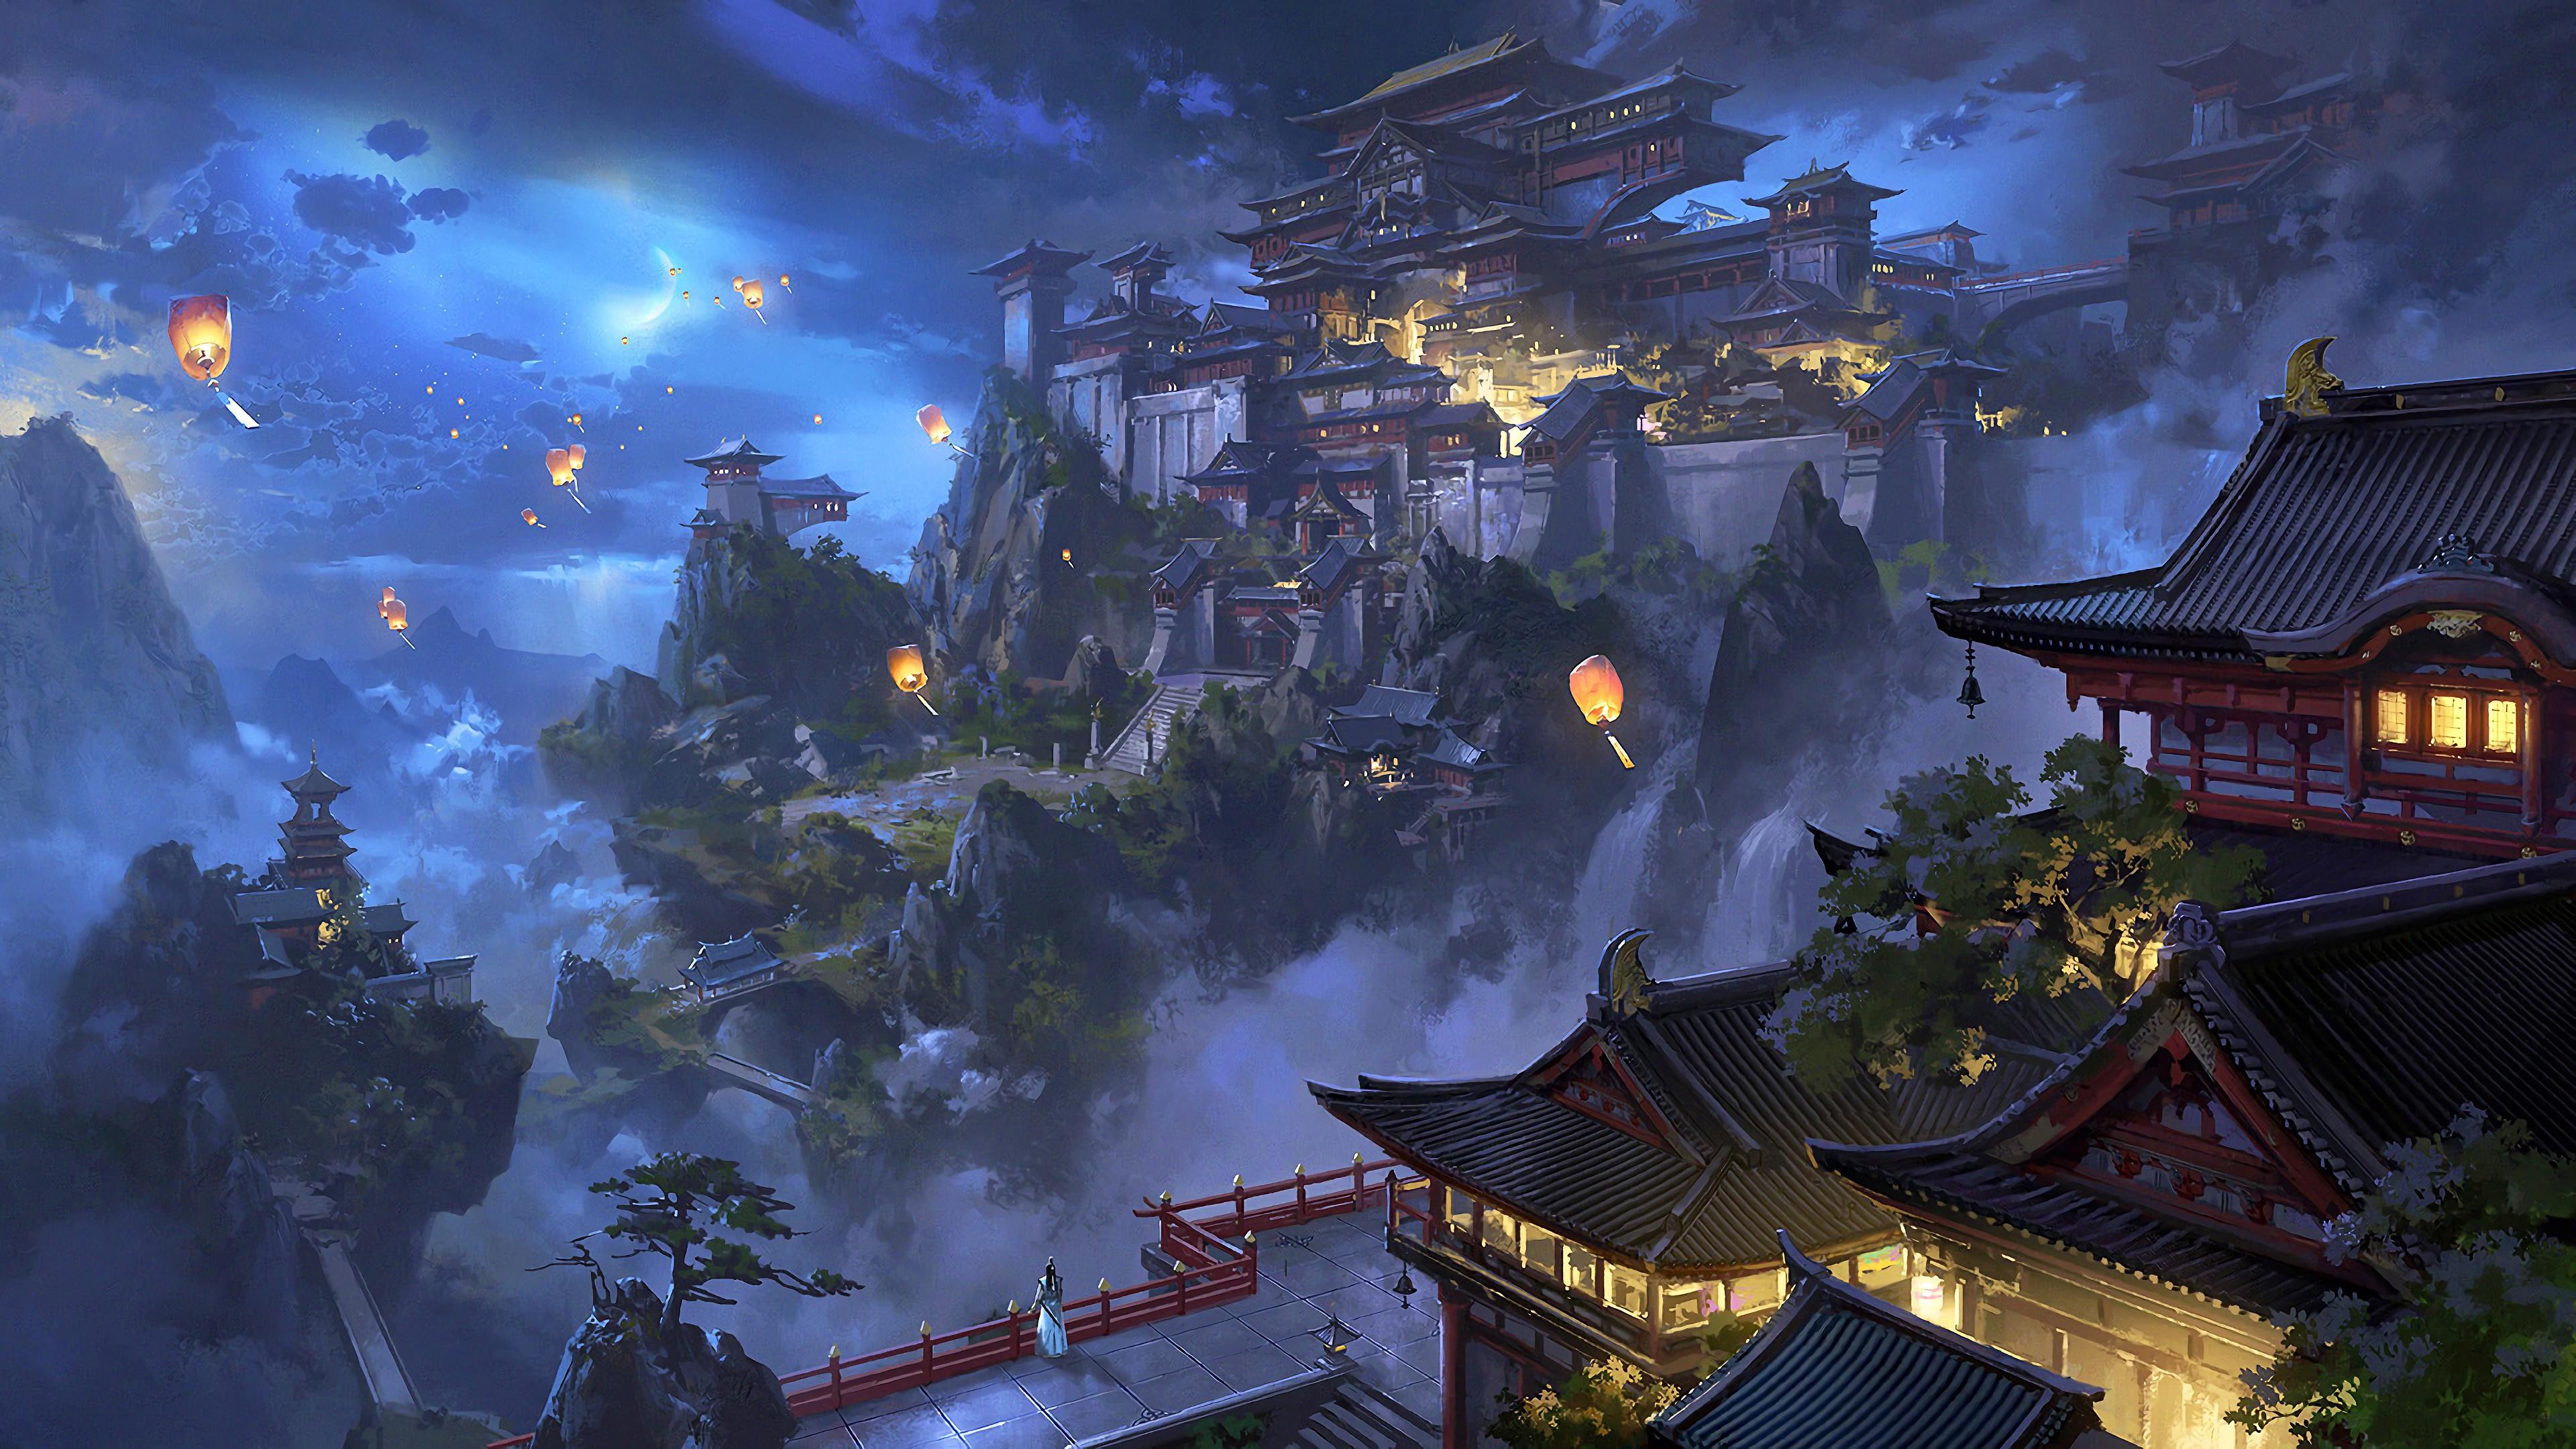 Anime Sky Lantern Mountain Japanese Castle Night Japan Anime Wallpaper 4k 3840x2160 Wallpaper Teahub Io